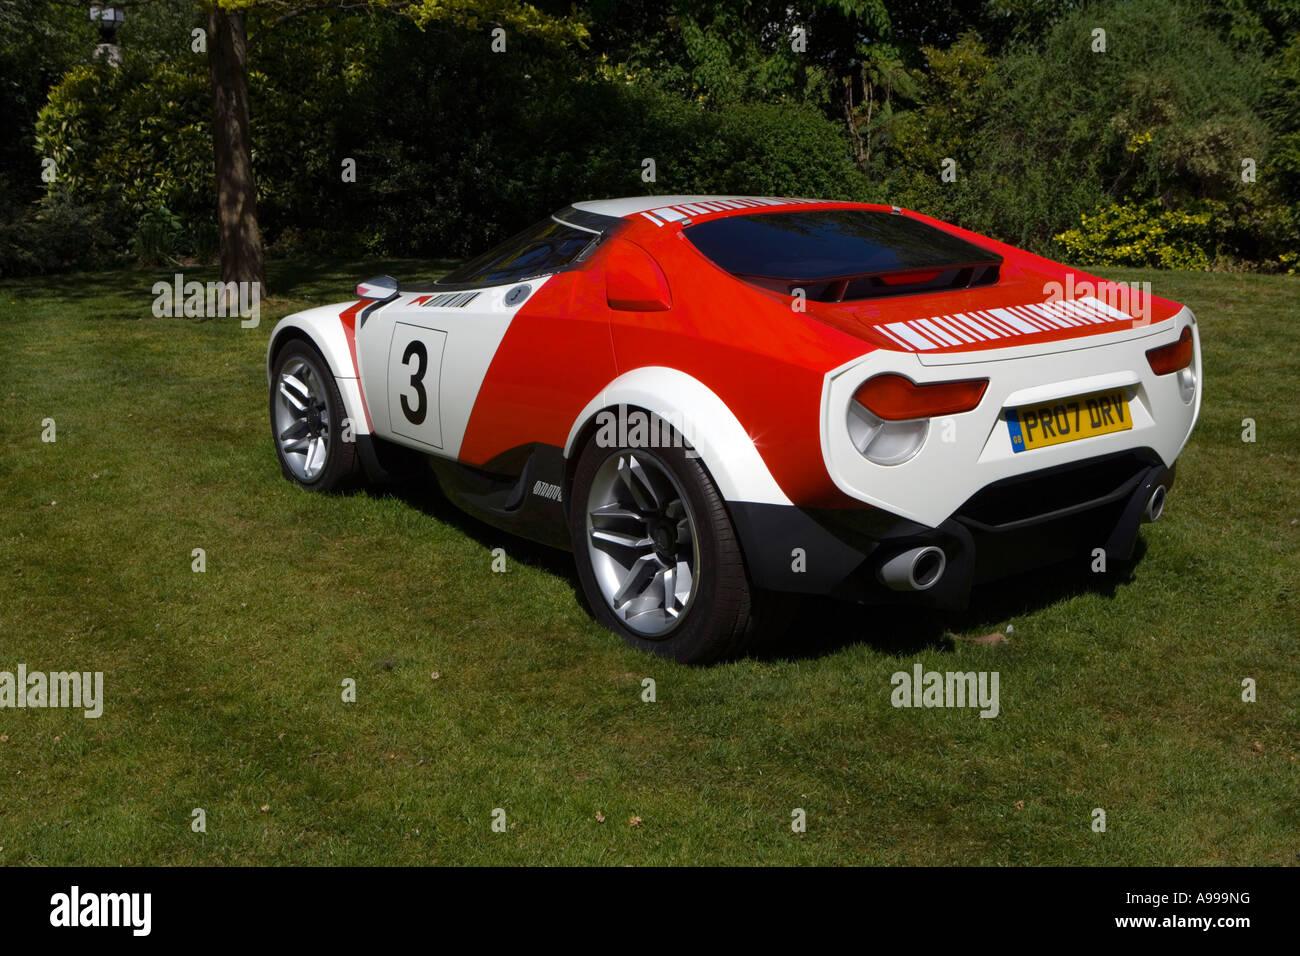 Lancia Stratos exhibit in gardens of Regent's Park College, London - Stock Image